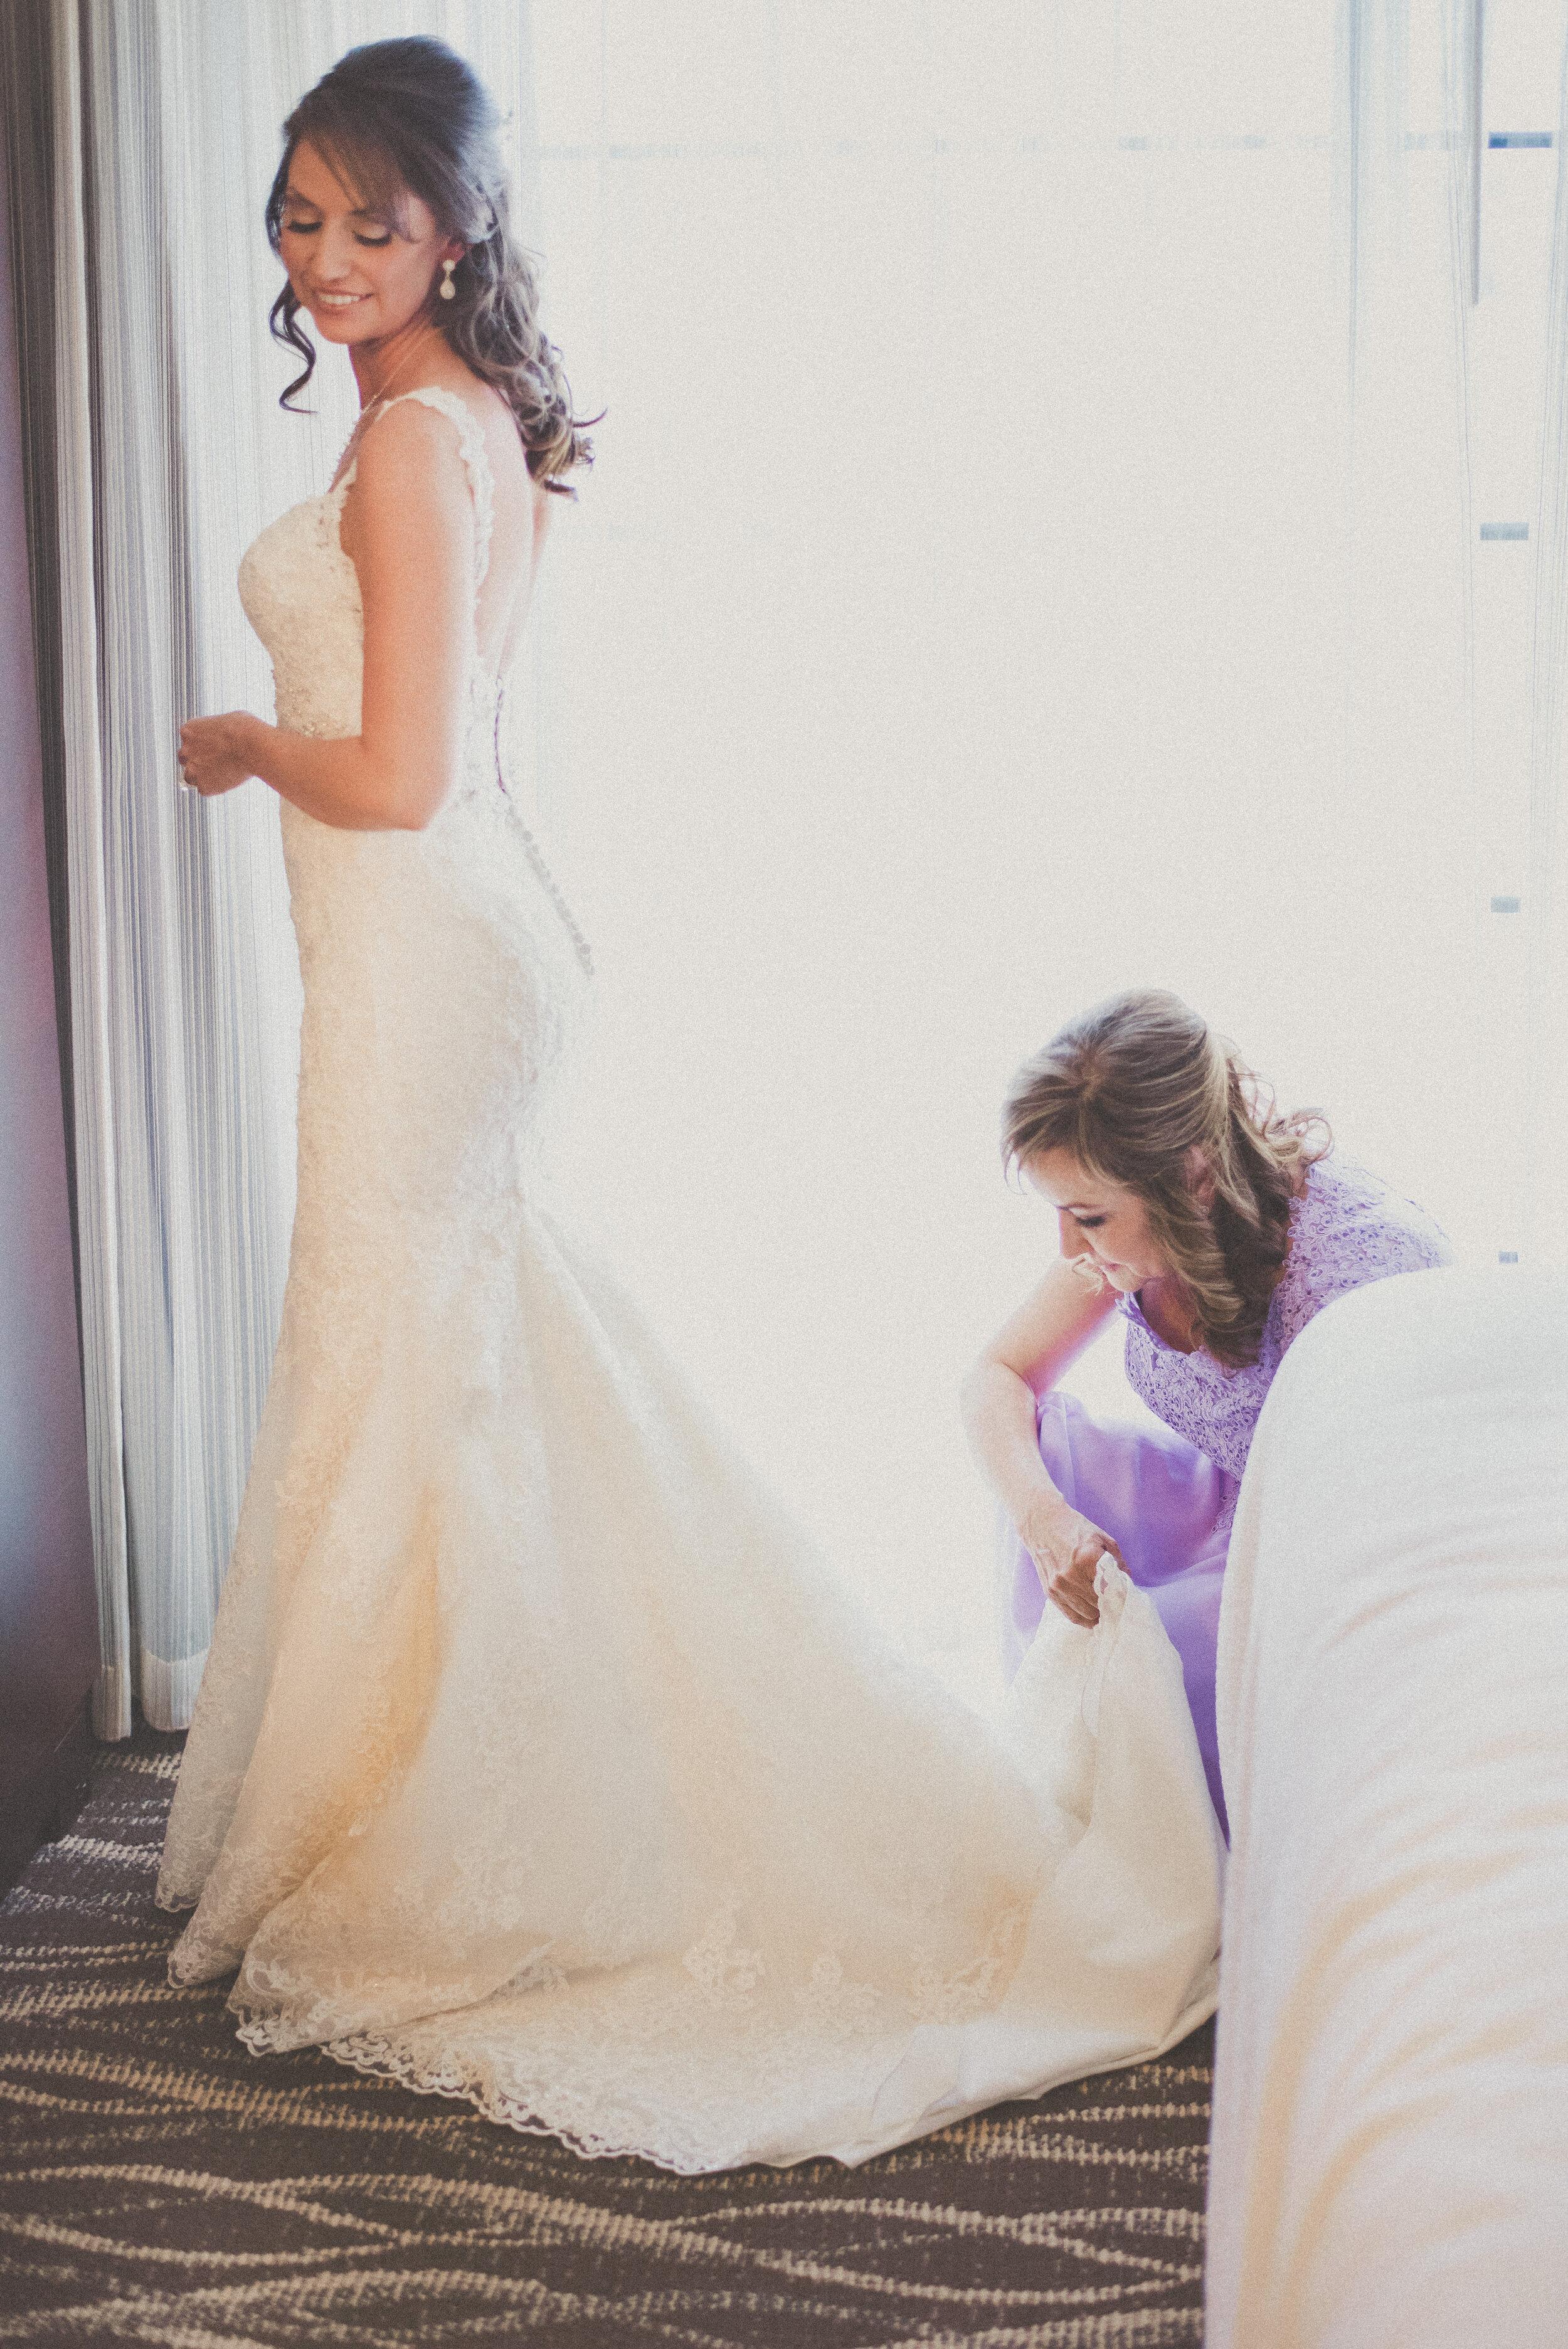 Roberts Wedding - Getting Ready-29.jpg